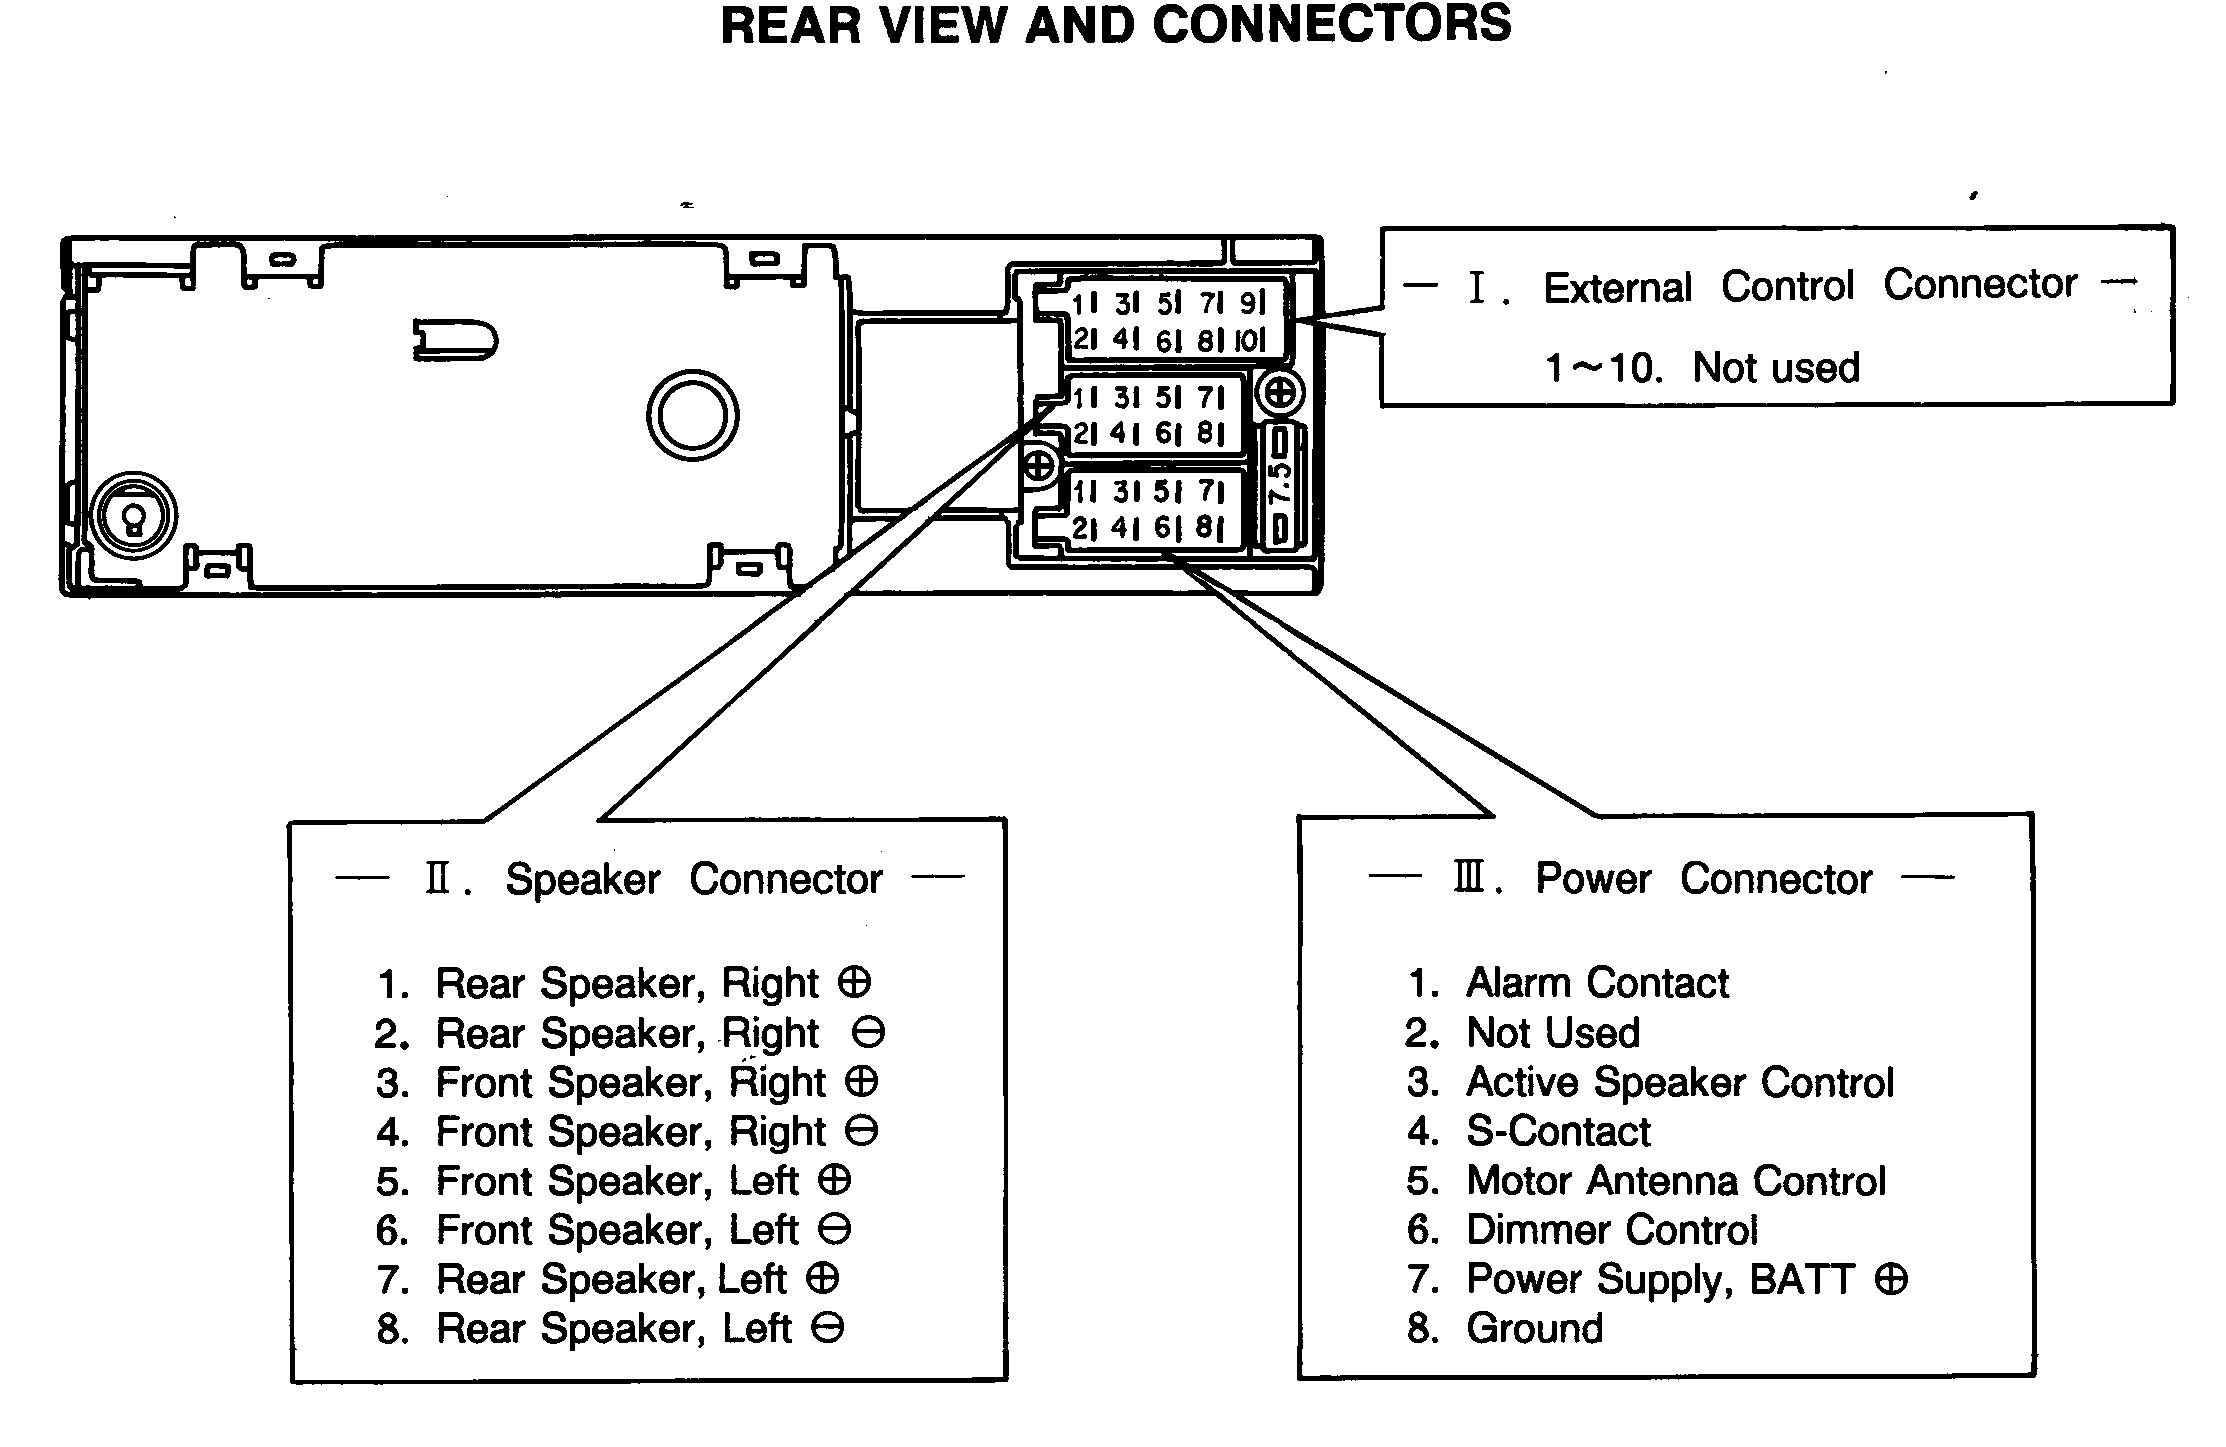 Car Audio Wiring Adapters Stereo Adapter Kits Auto Arresting Honda Diagram